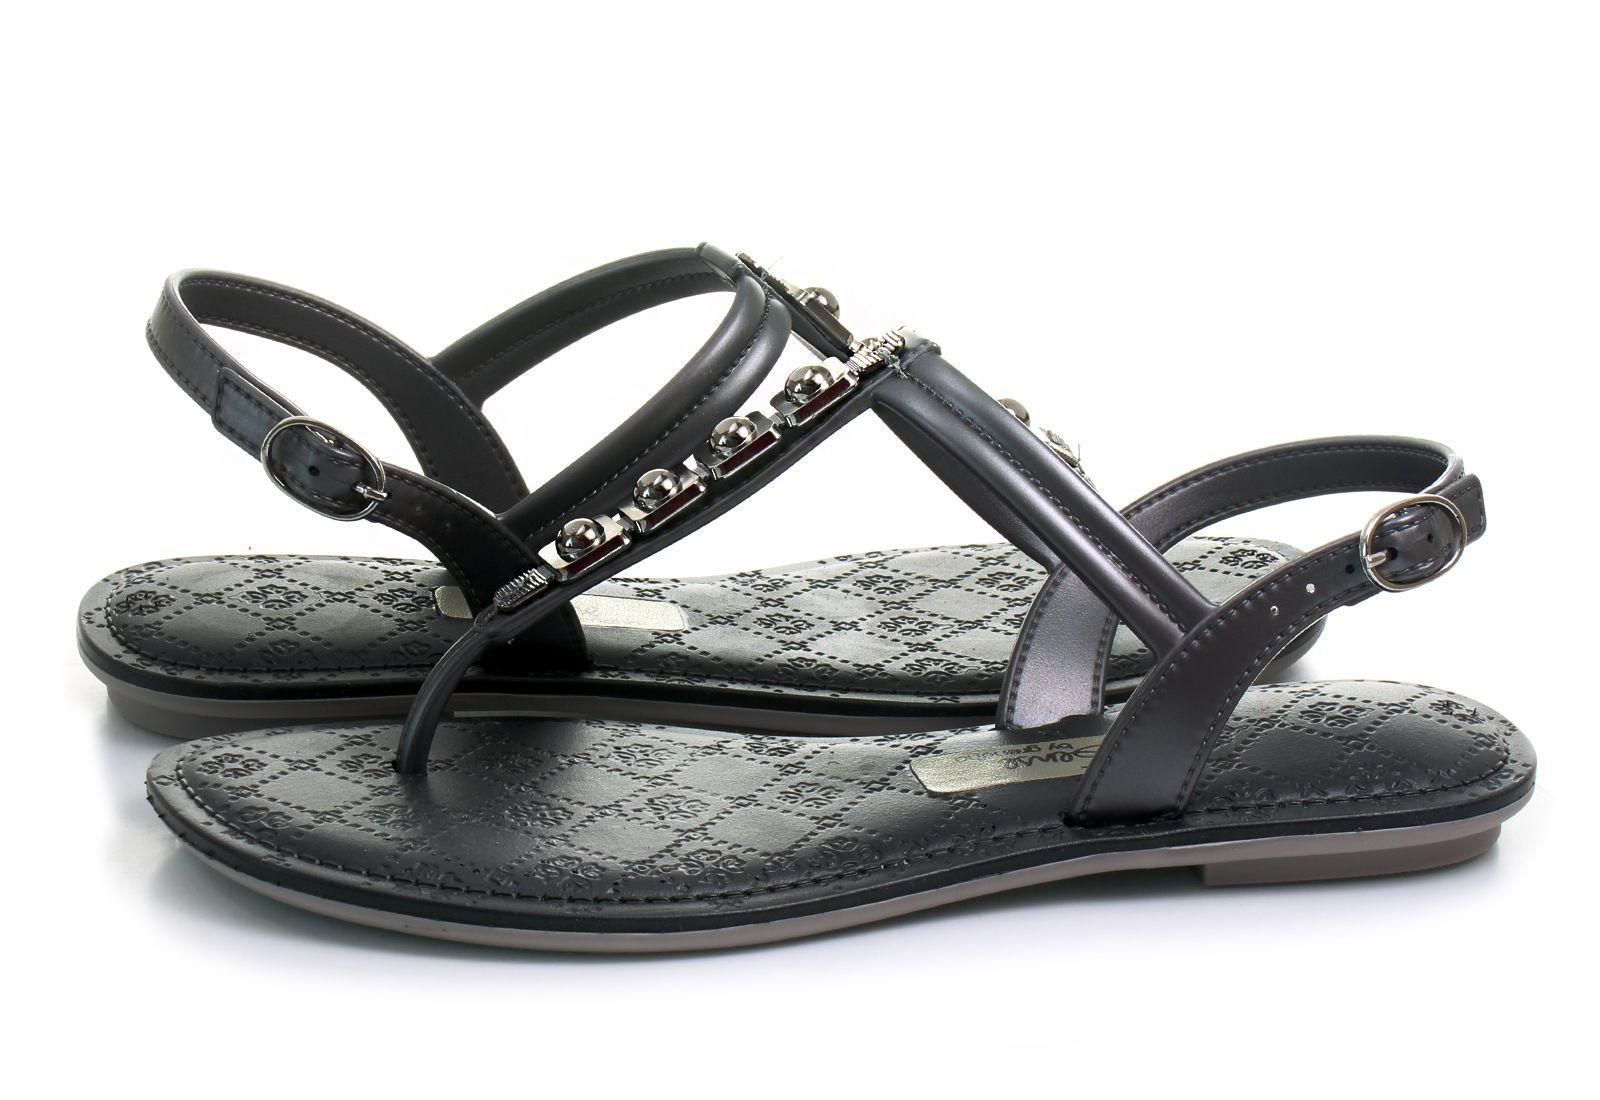 74f03a235c64a9 Grendha Sandals - Sense Jewel Sandal - 82145-24145 - Online shop ...